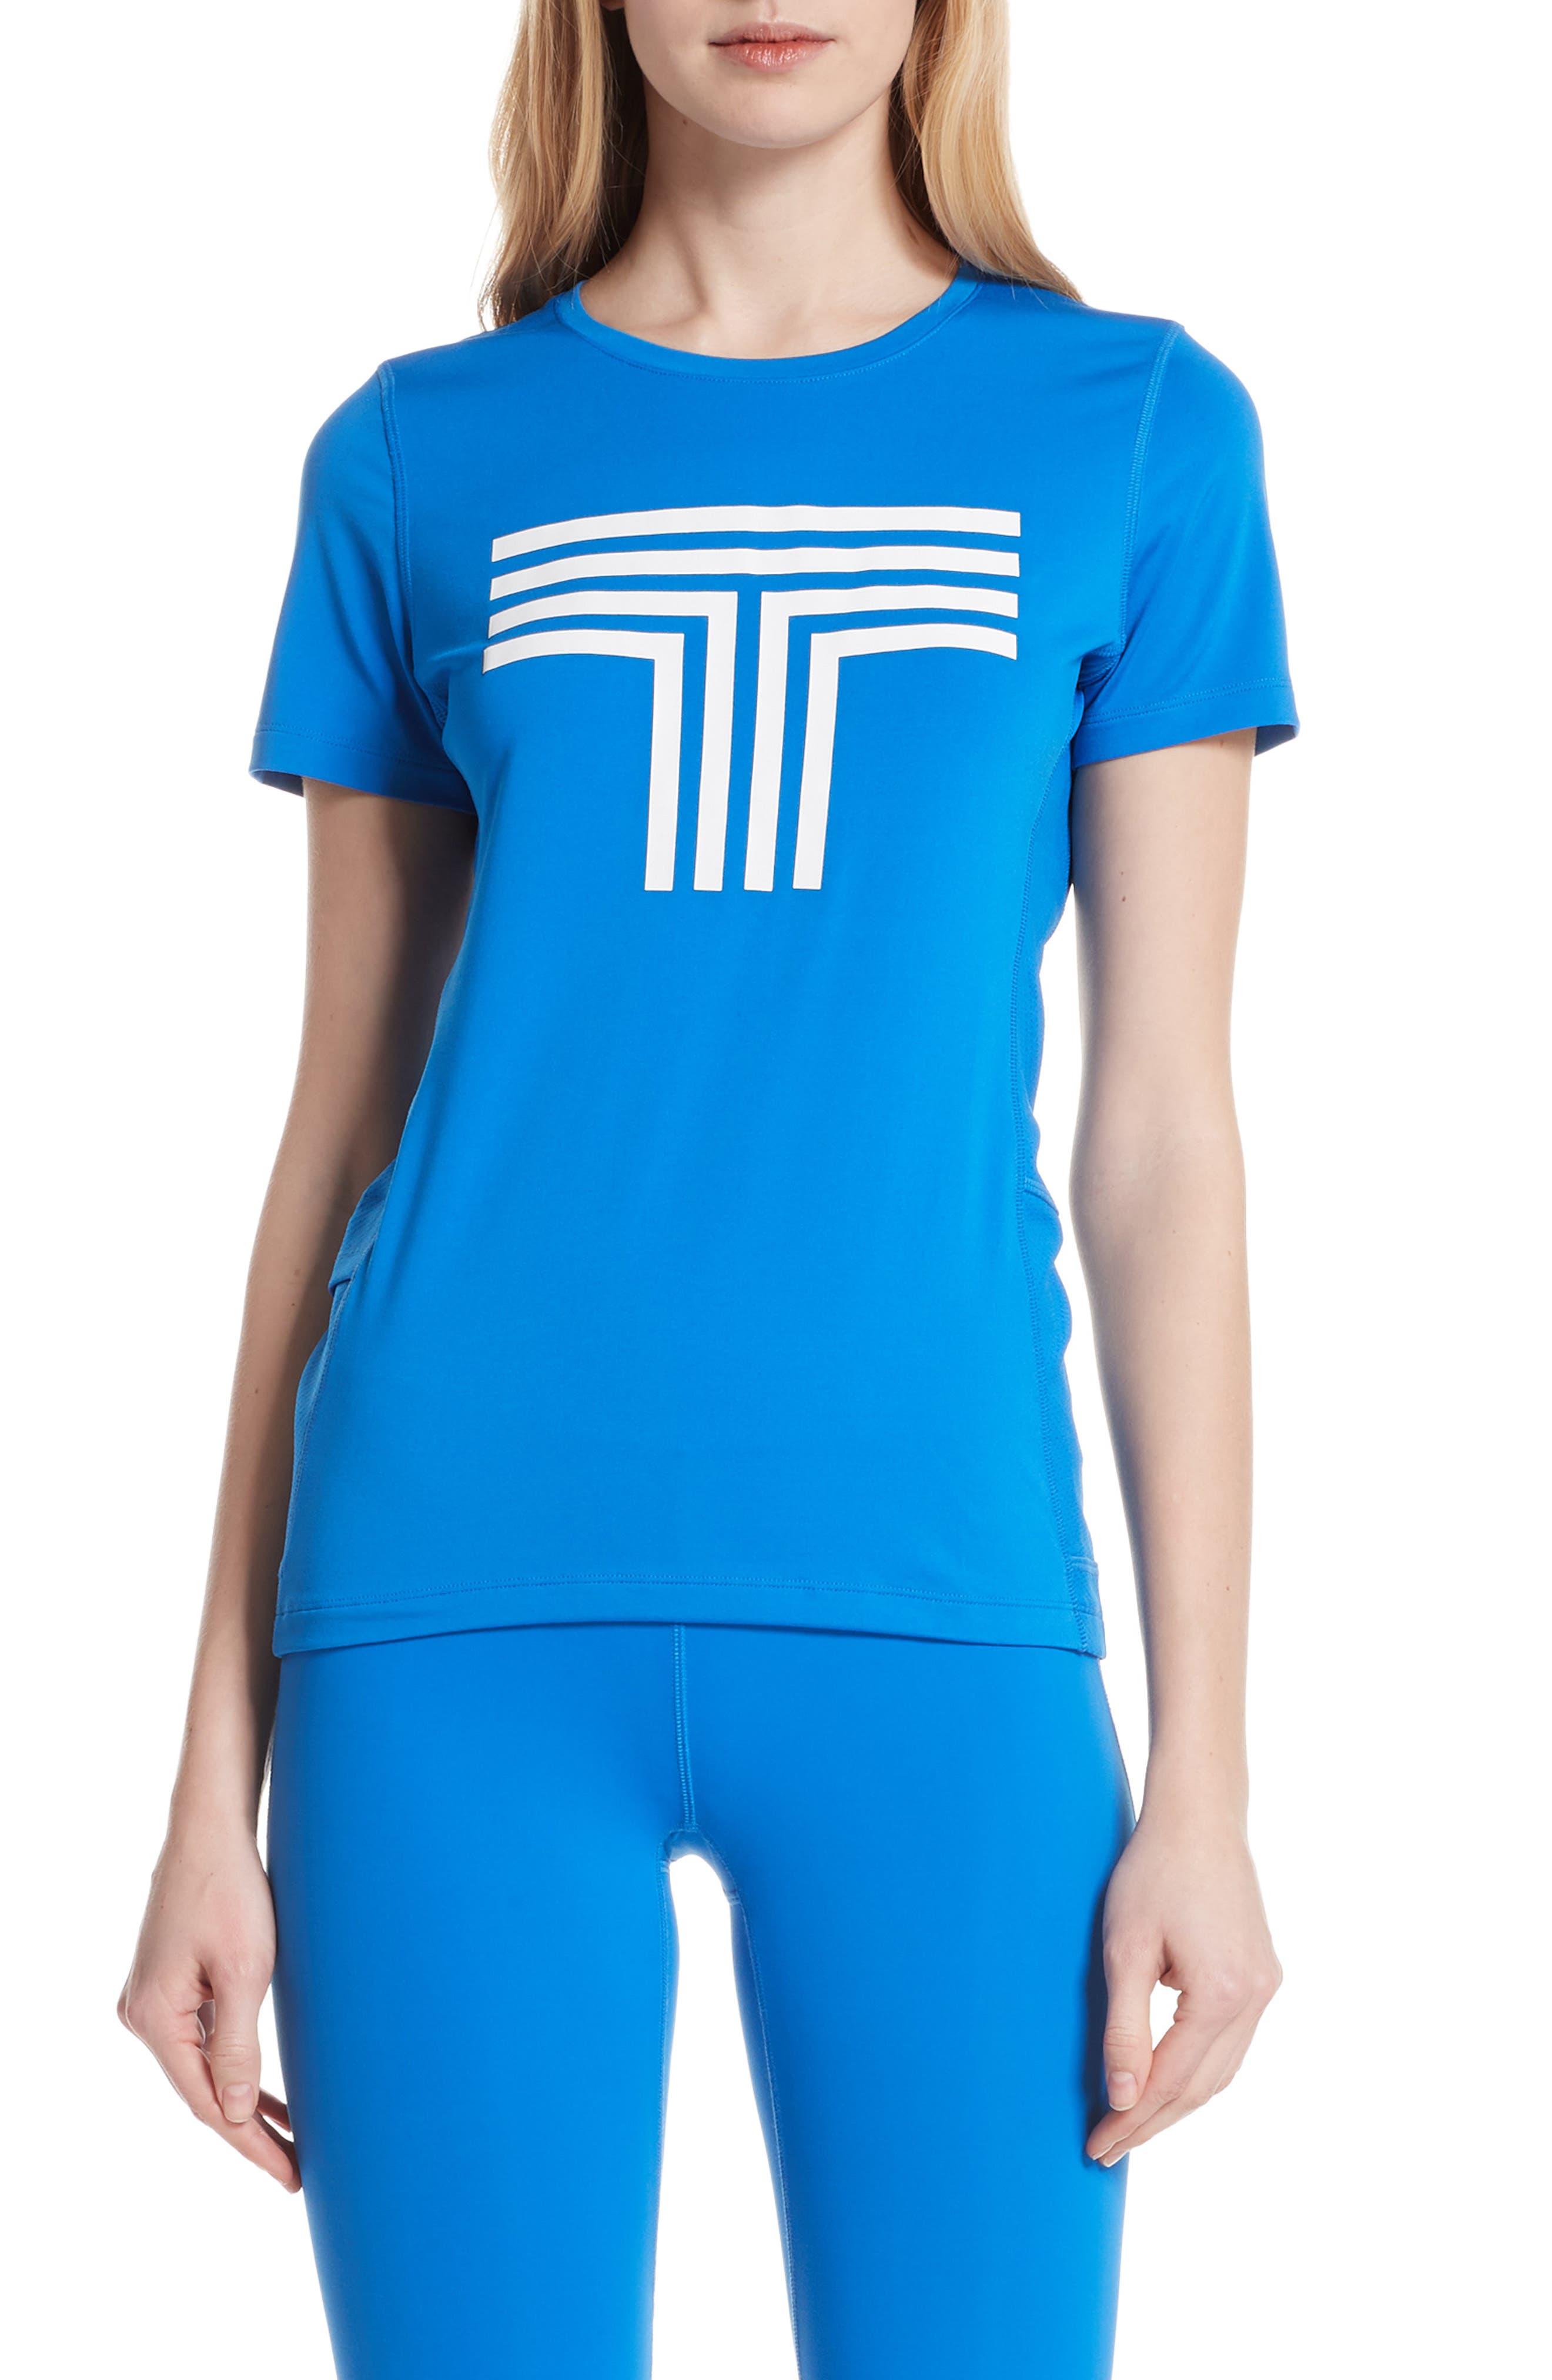 Tory Sport Logo Graphic Tee